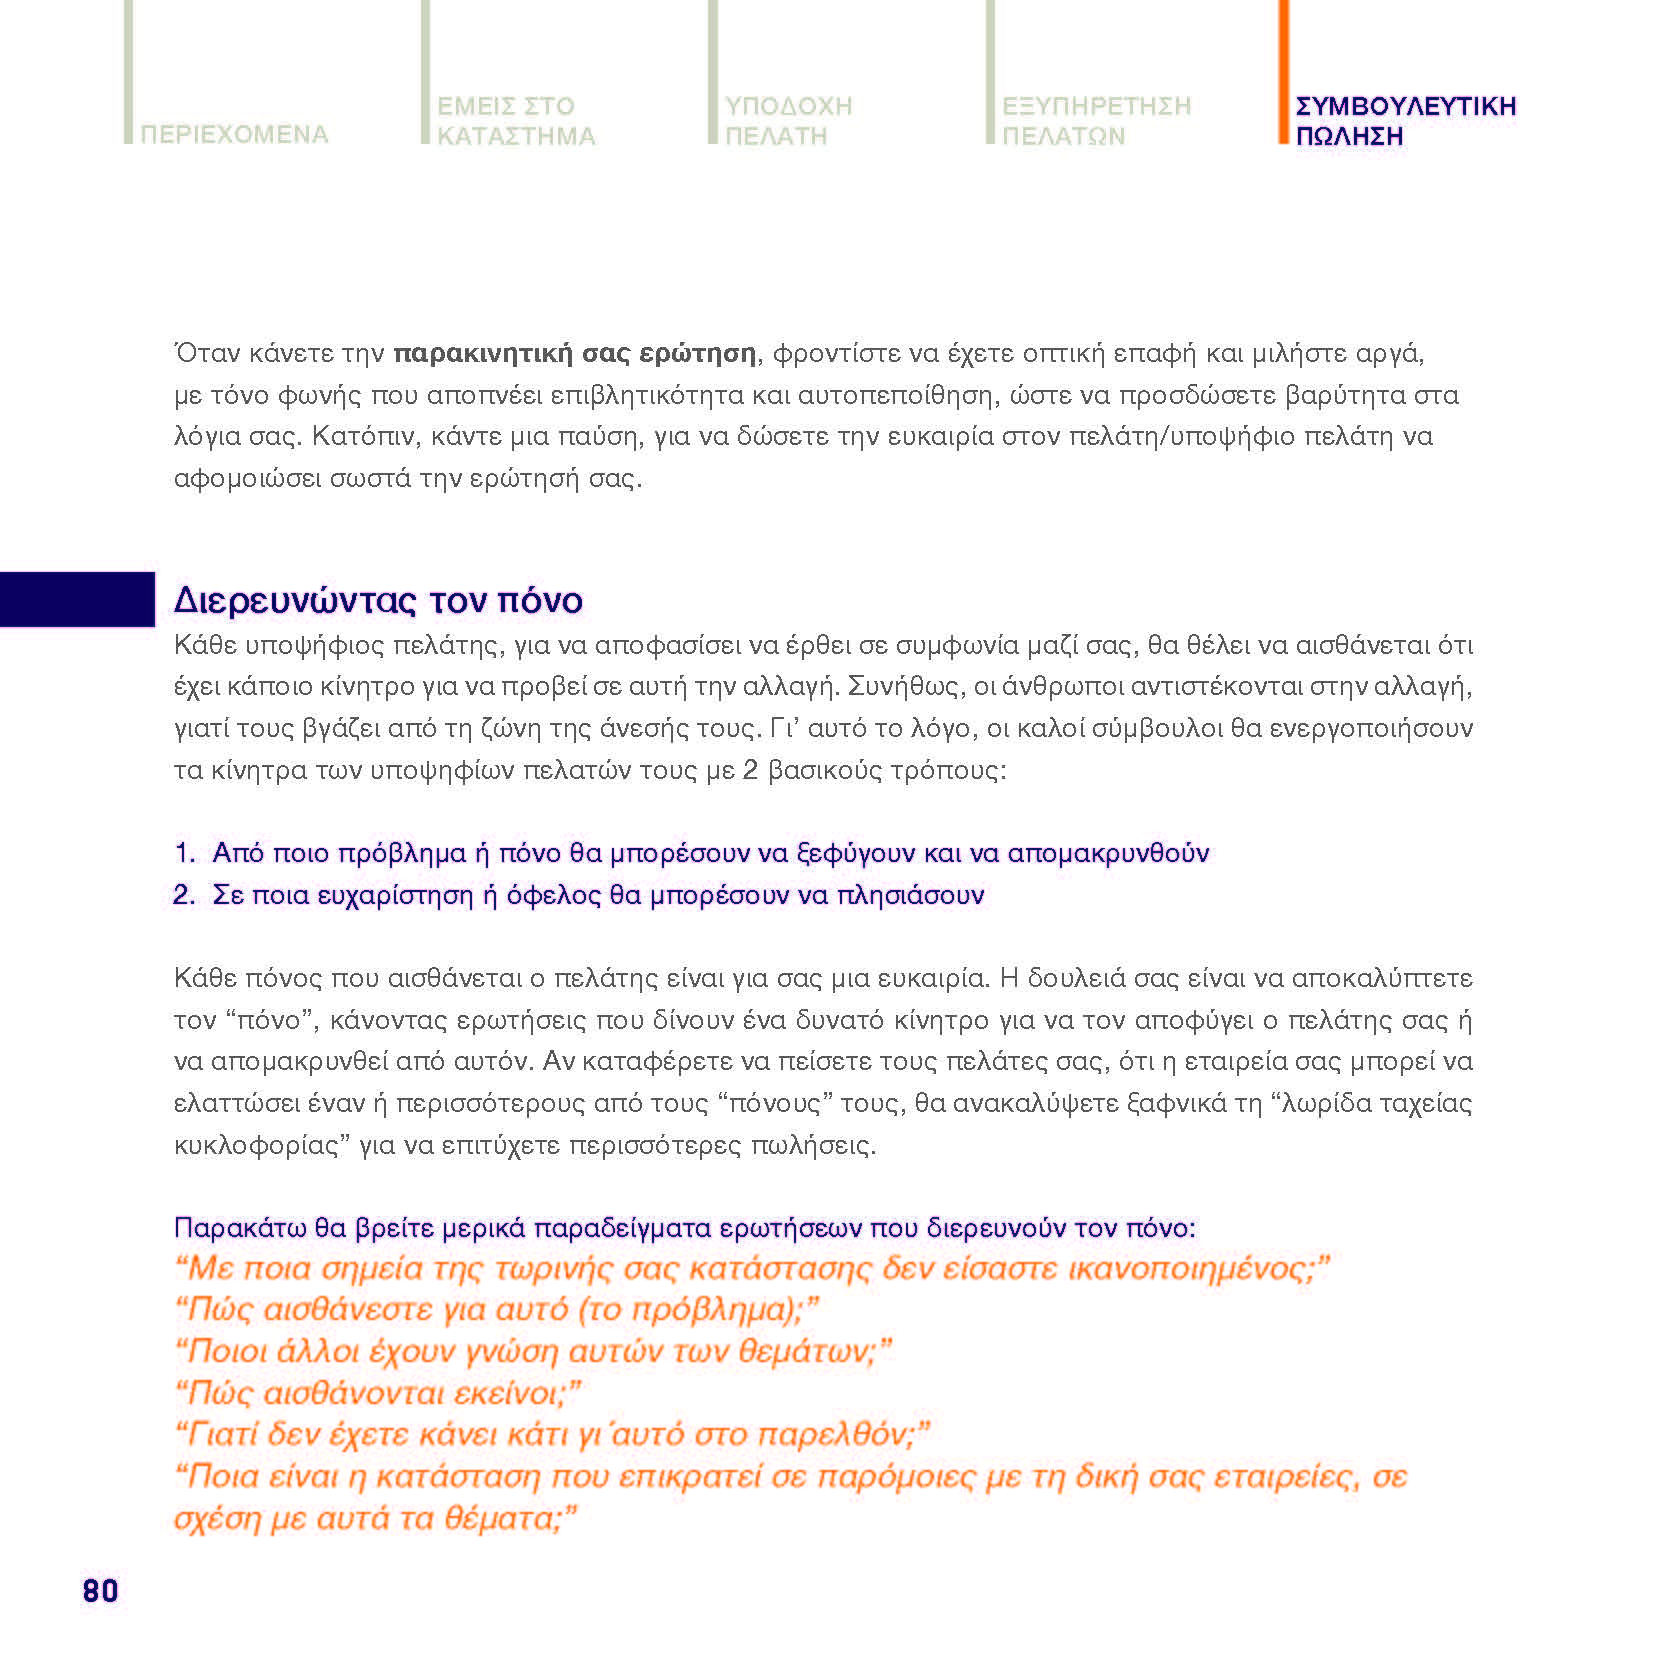 https://www.jib.gr/wp-content/uploads/2020/09/OPTIMA-BANK-BOOKLET-WEB_Page_080.jpg